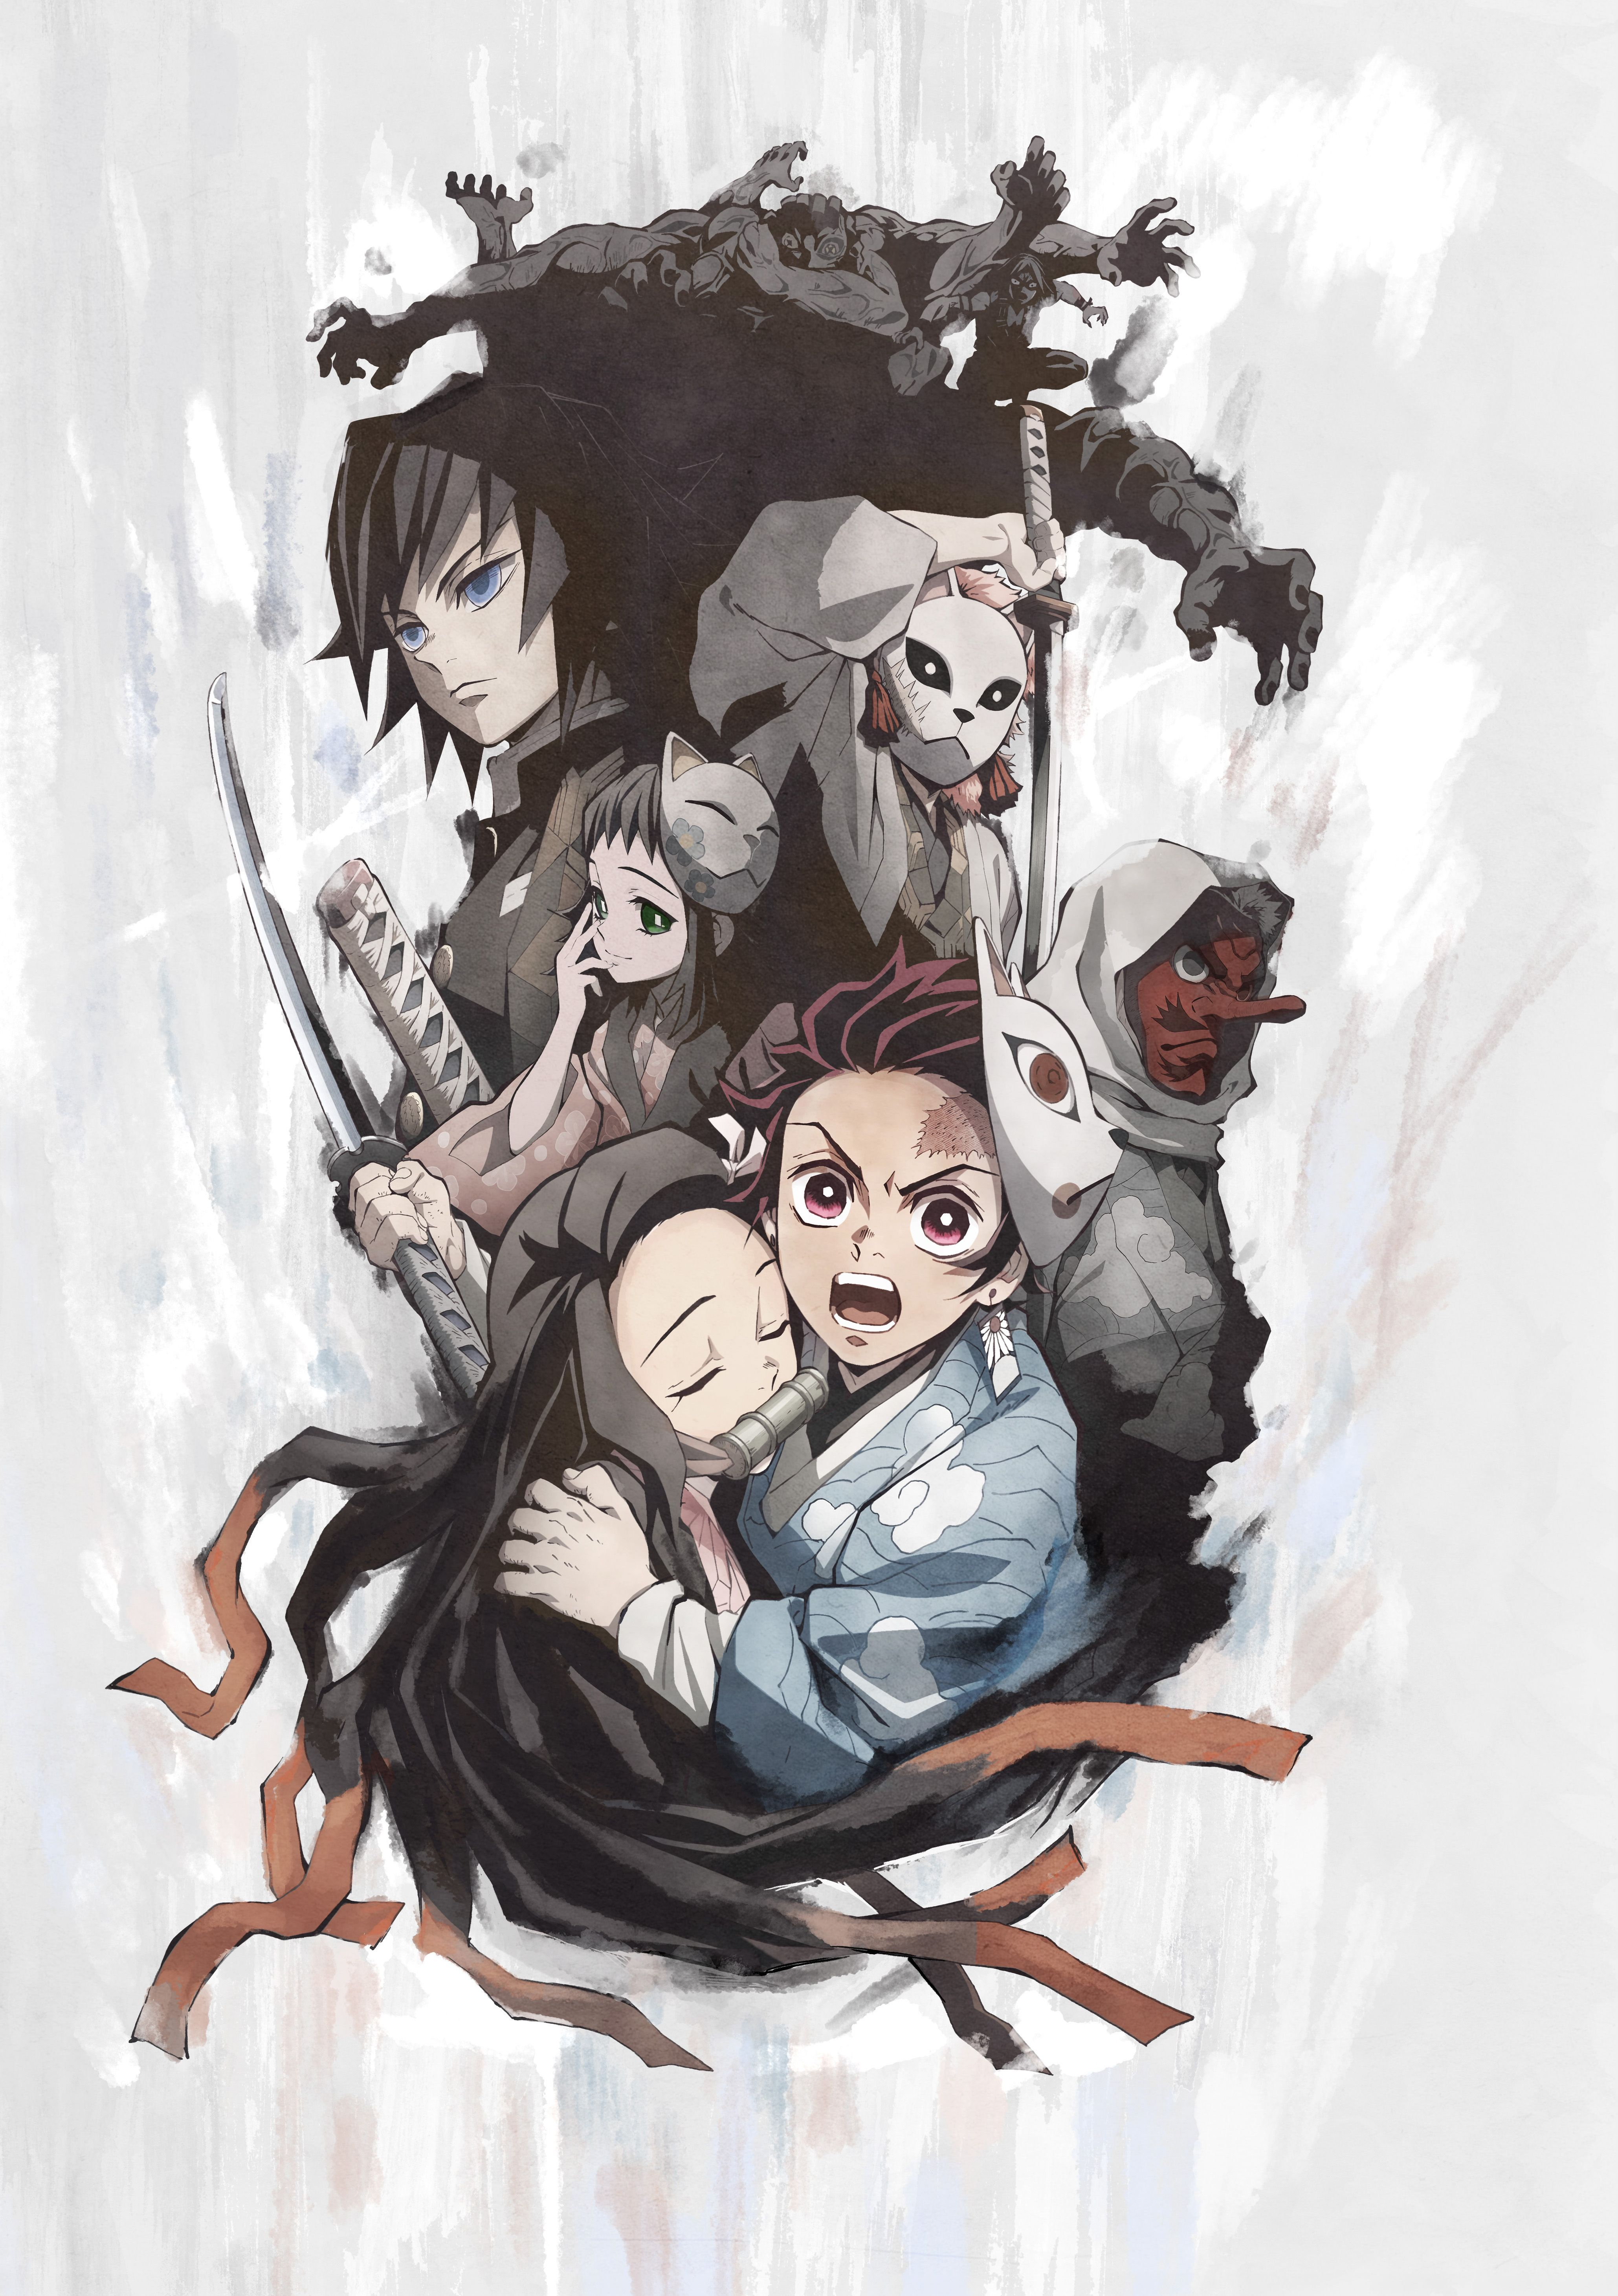 Aesthetic Kimetsu No Yaiba Wallpaper Hd Phone Anime Wallpapers